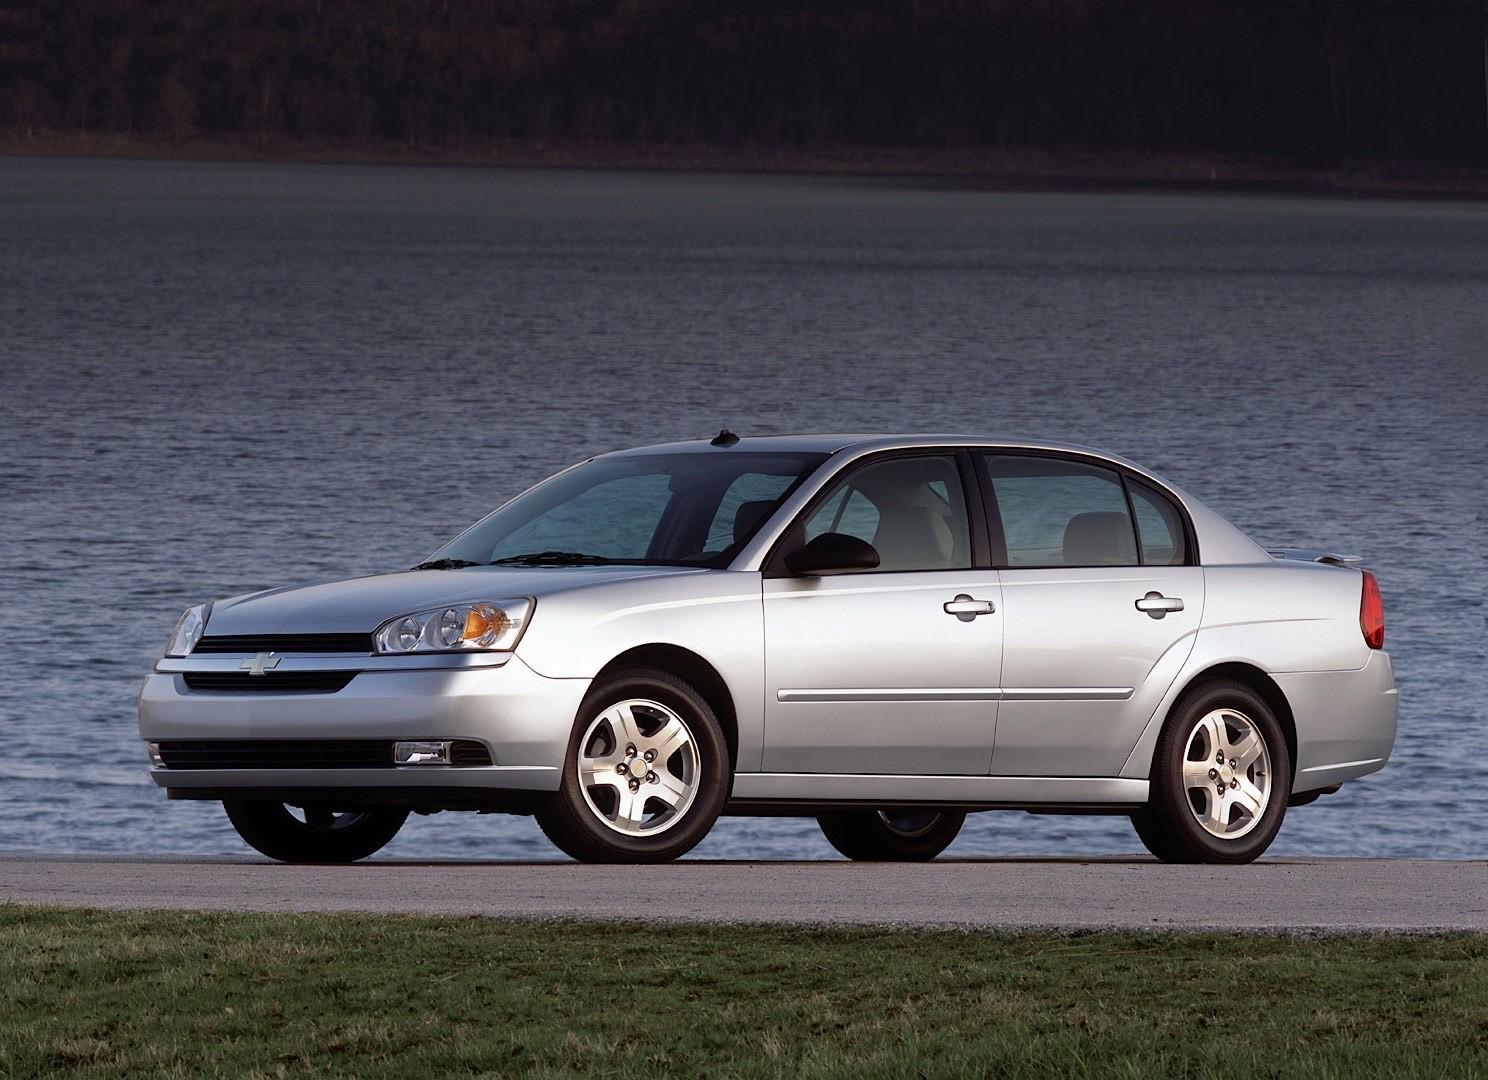 Chevrolet Built 10 Million Malibu Models Over 51 Years Autoevolution